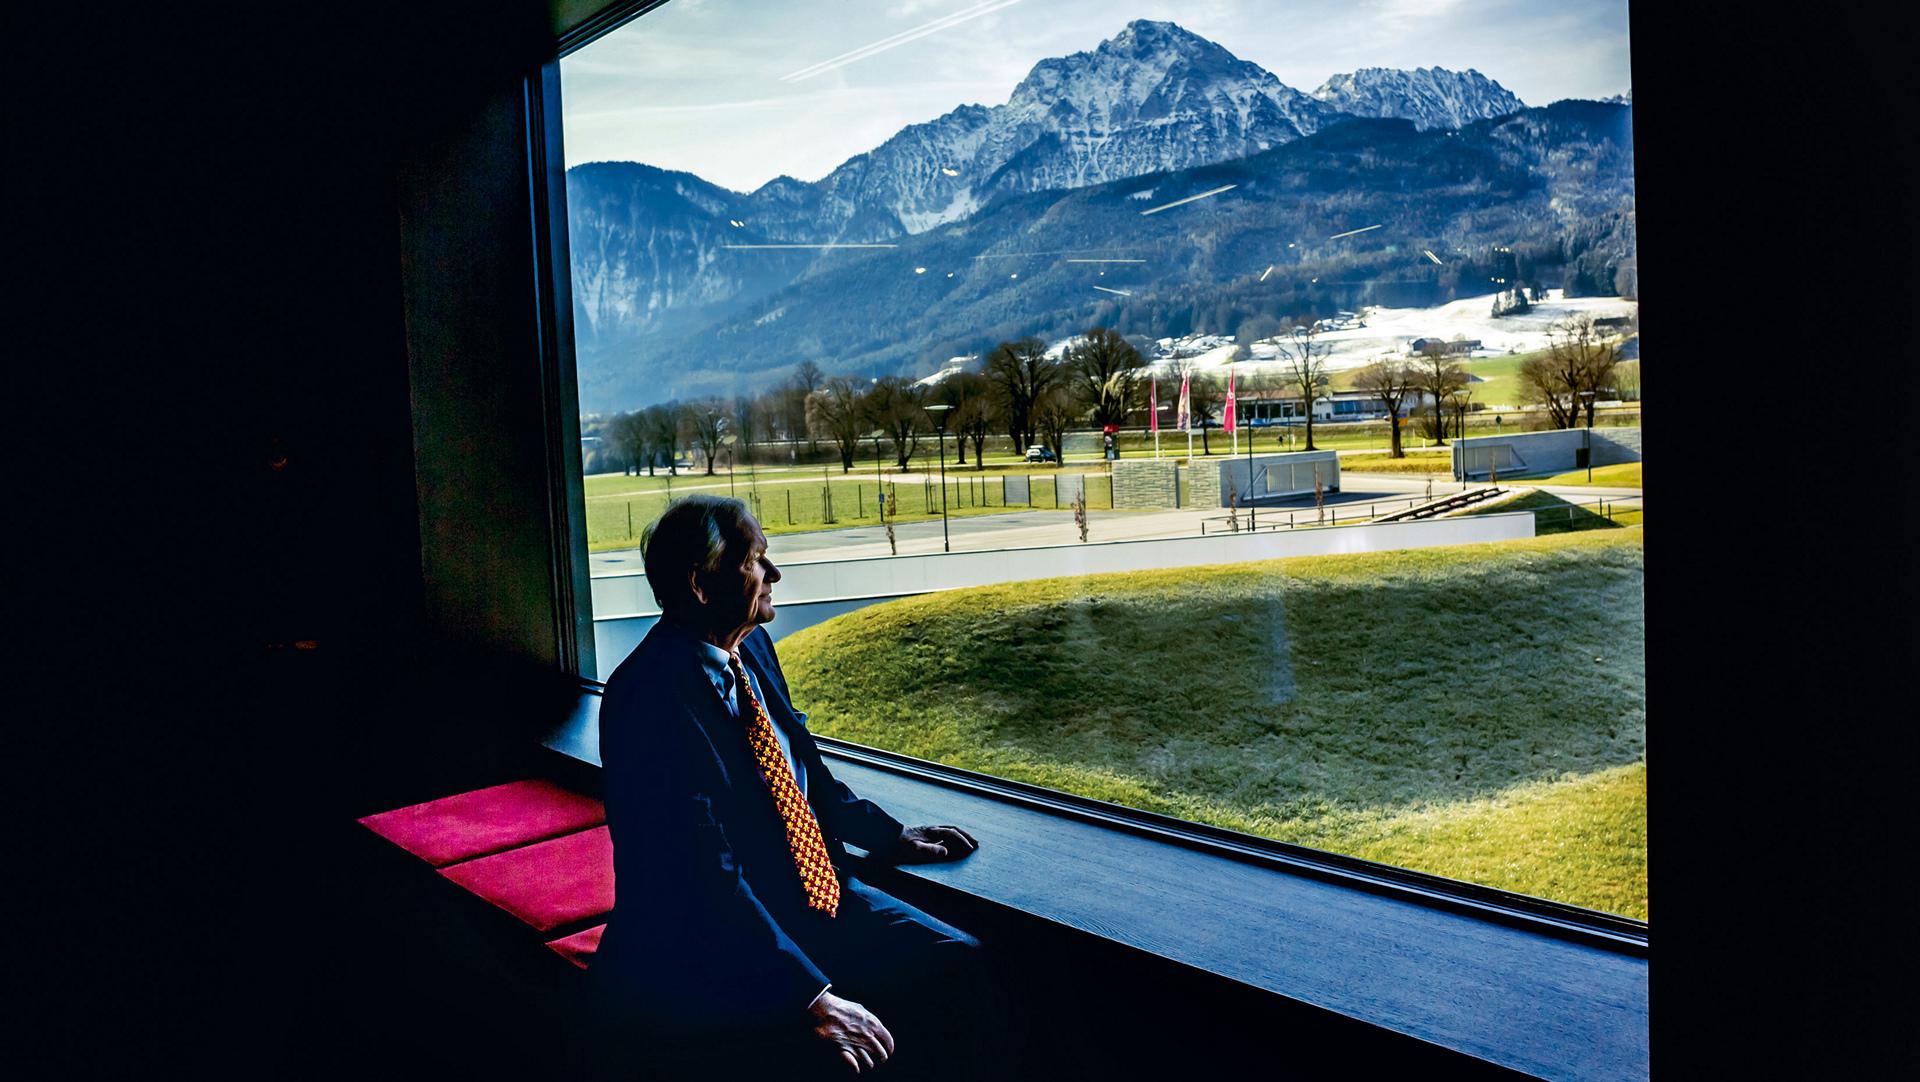 Hans-Peter Porsche, member of the Supervisory Board of Porsche AG and of Porsche Automobil Holding SE, district of Berchtesgadener Land © Dr. Ing. h.c. F. Porsche AG